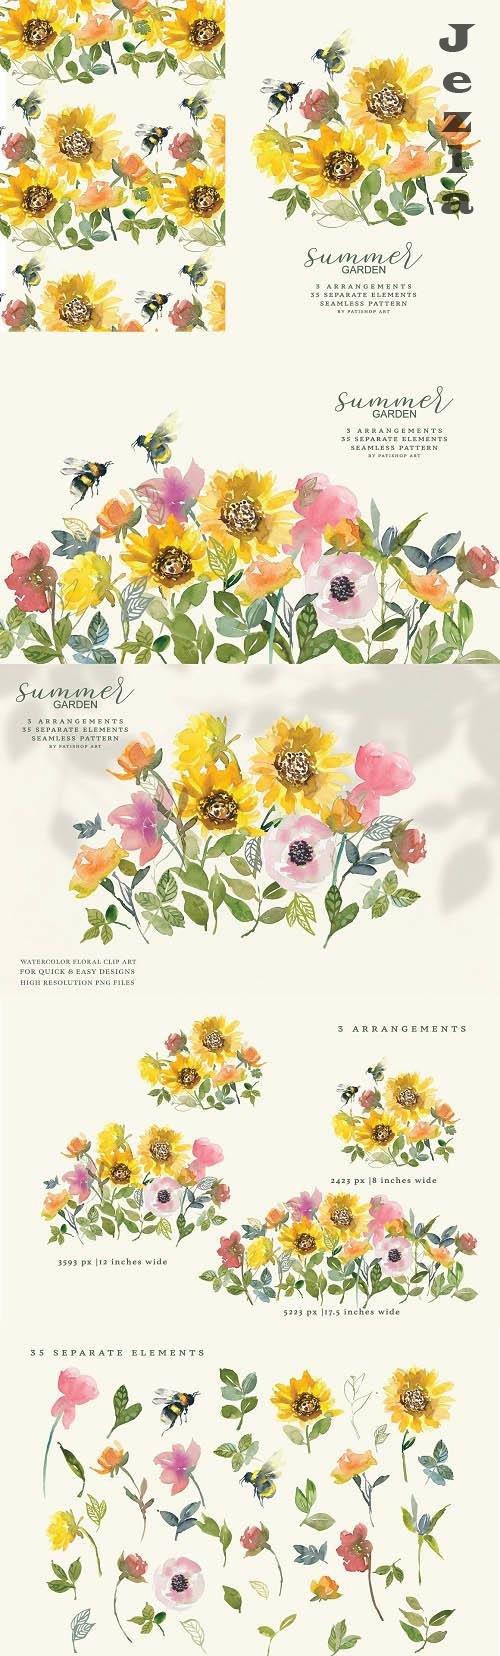 Watercolor Sunflower Clipart Set - 6235056